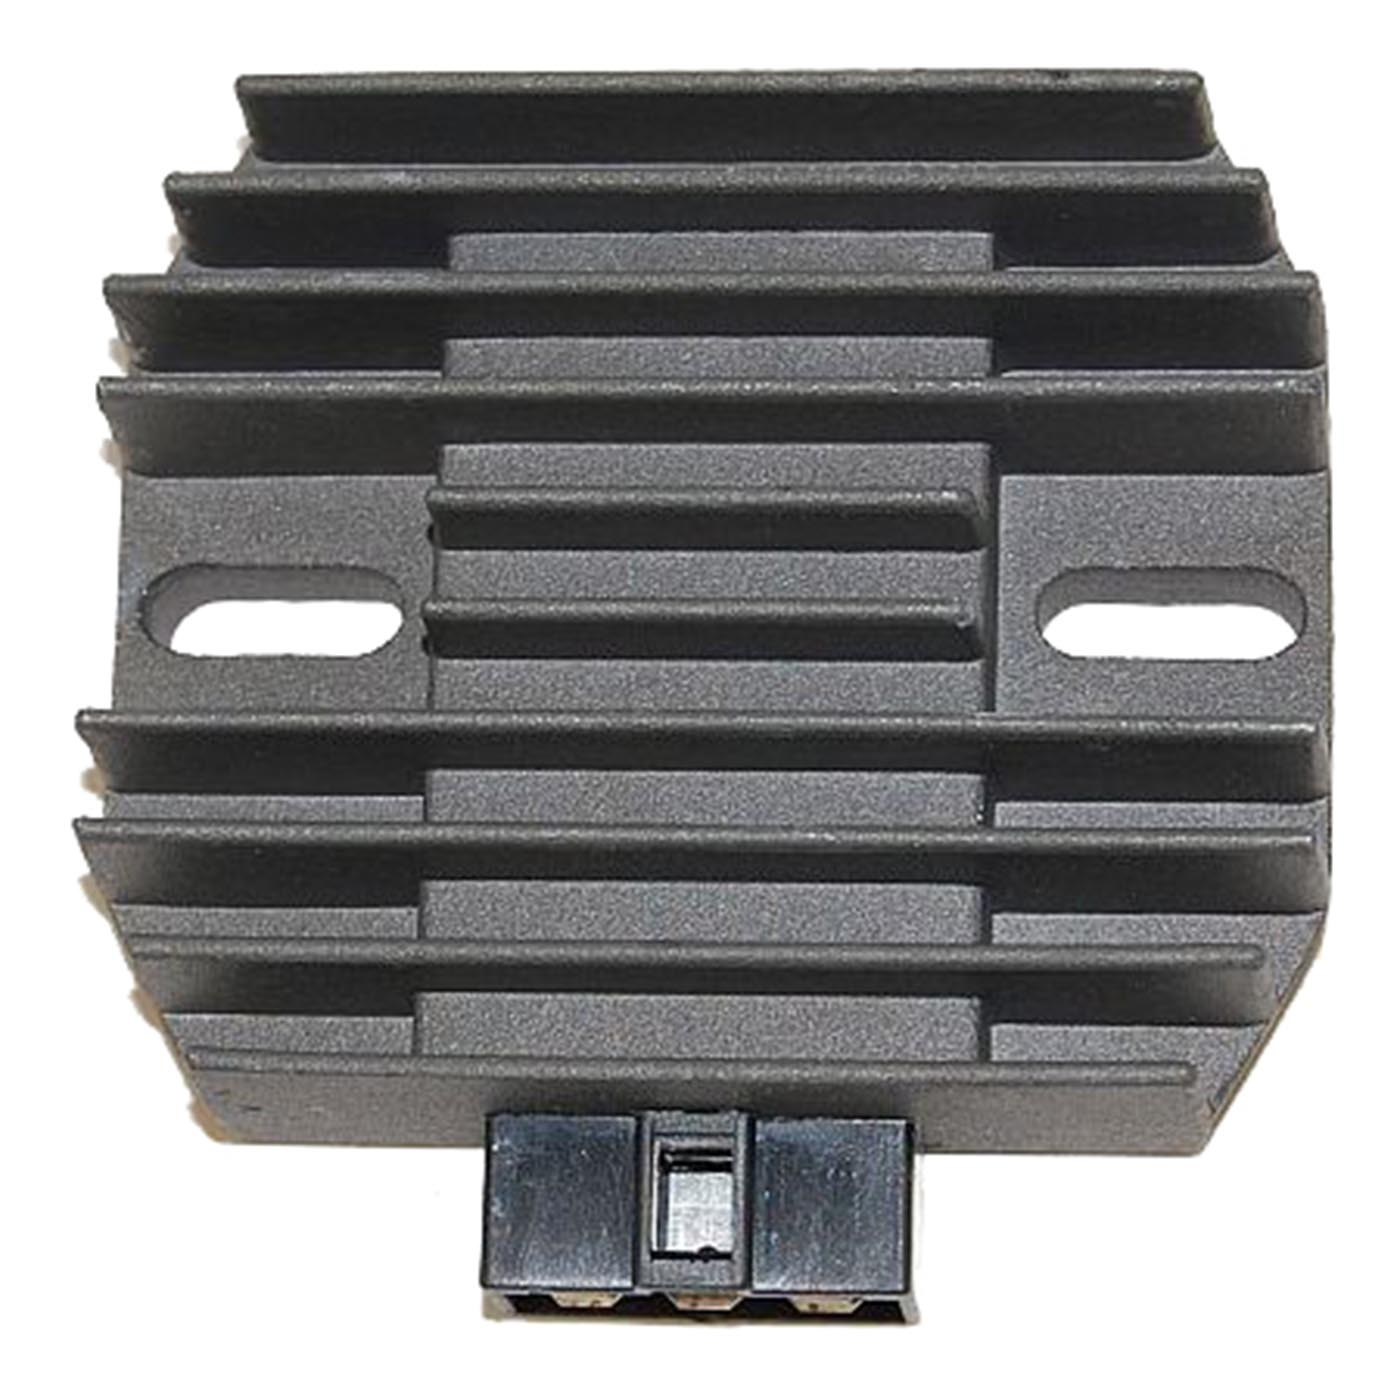 Regulator//Rectifier For 1993 Kawasaki ZX600 Ninja 600R~ElectroSport Industries